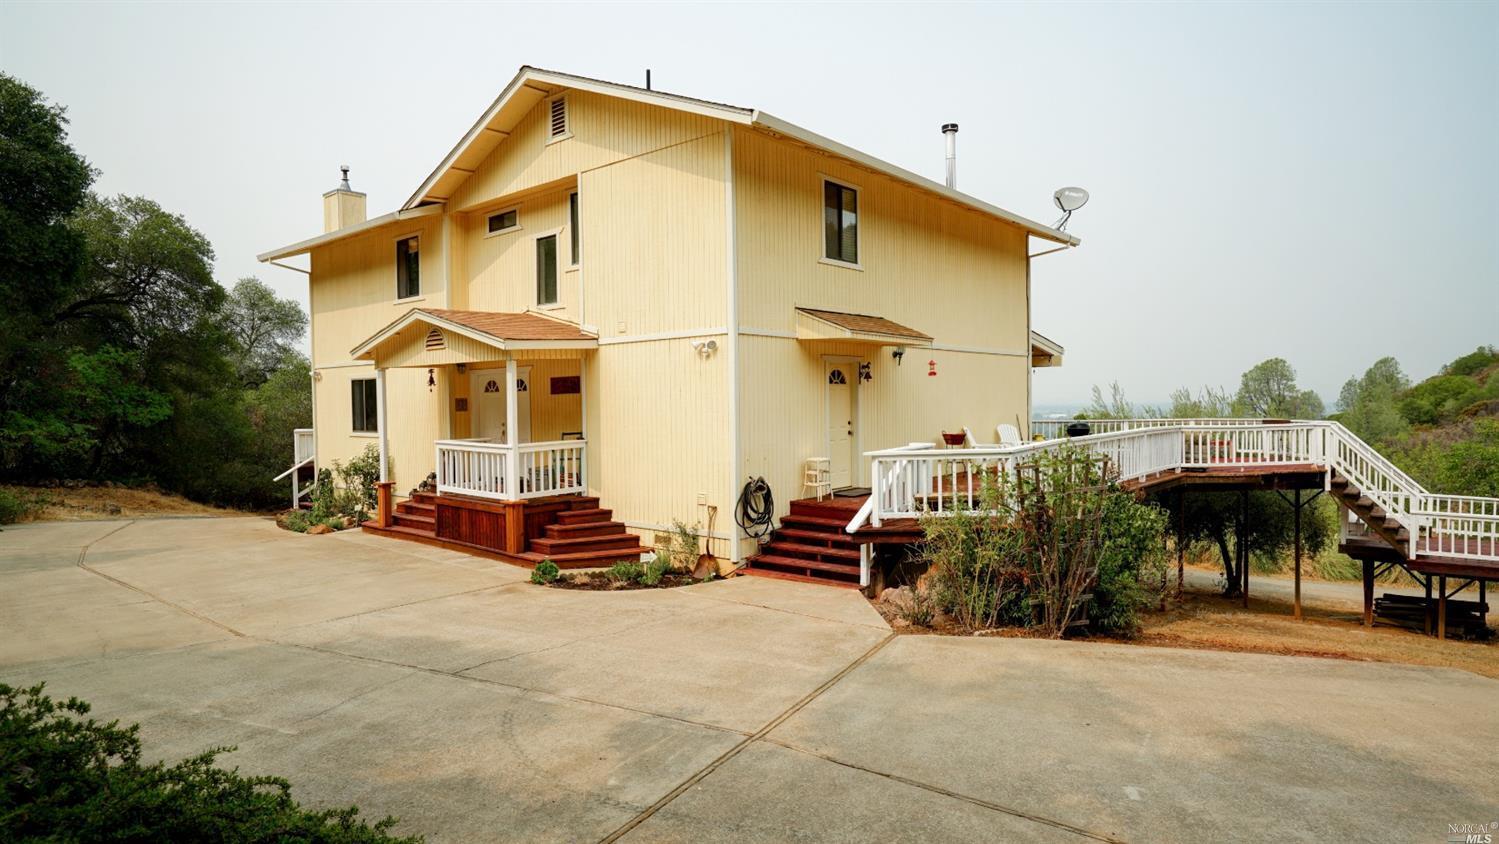 Photo of Kelseyville, CA 95451